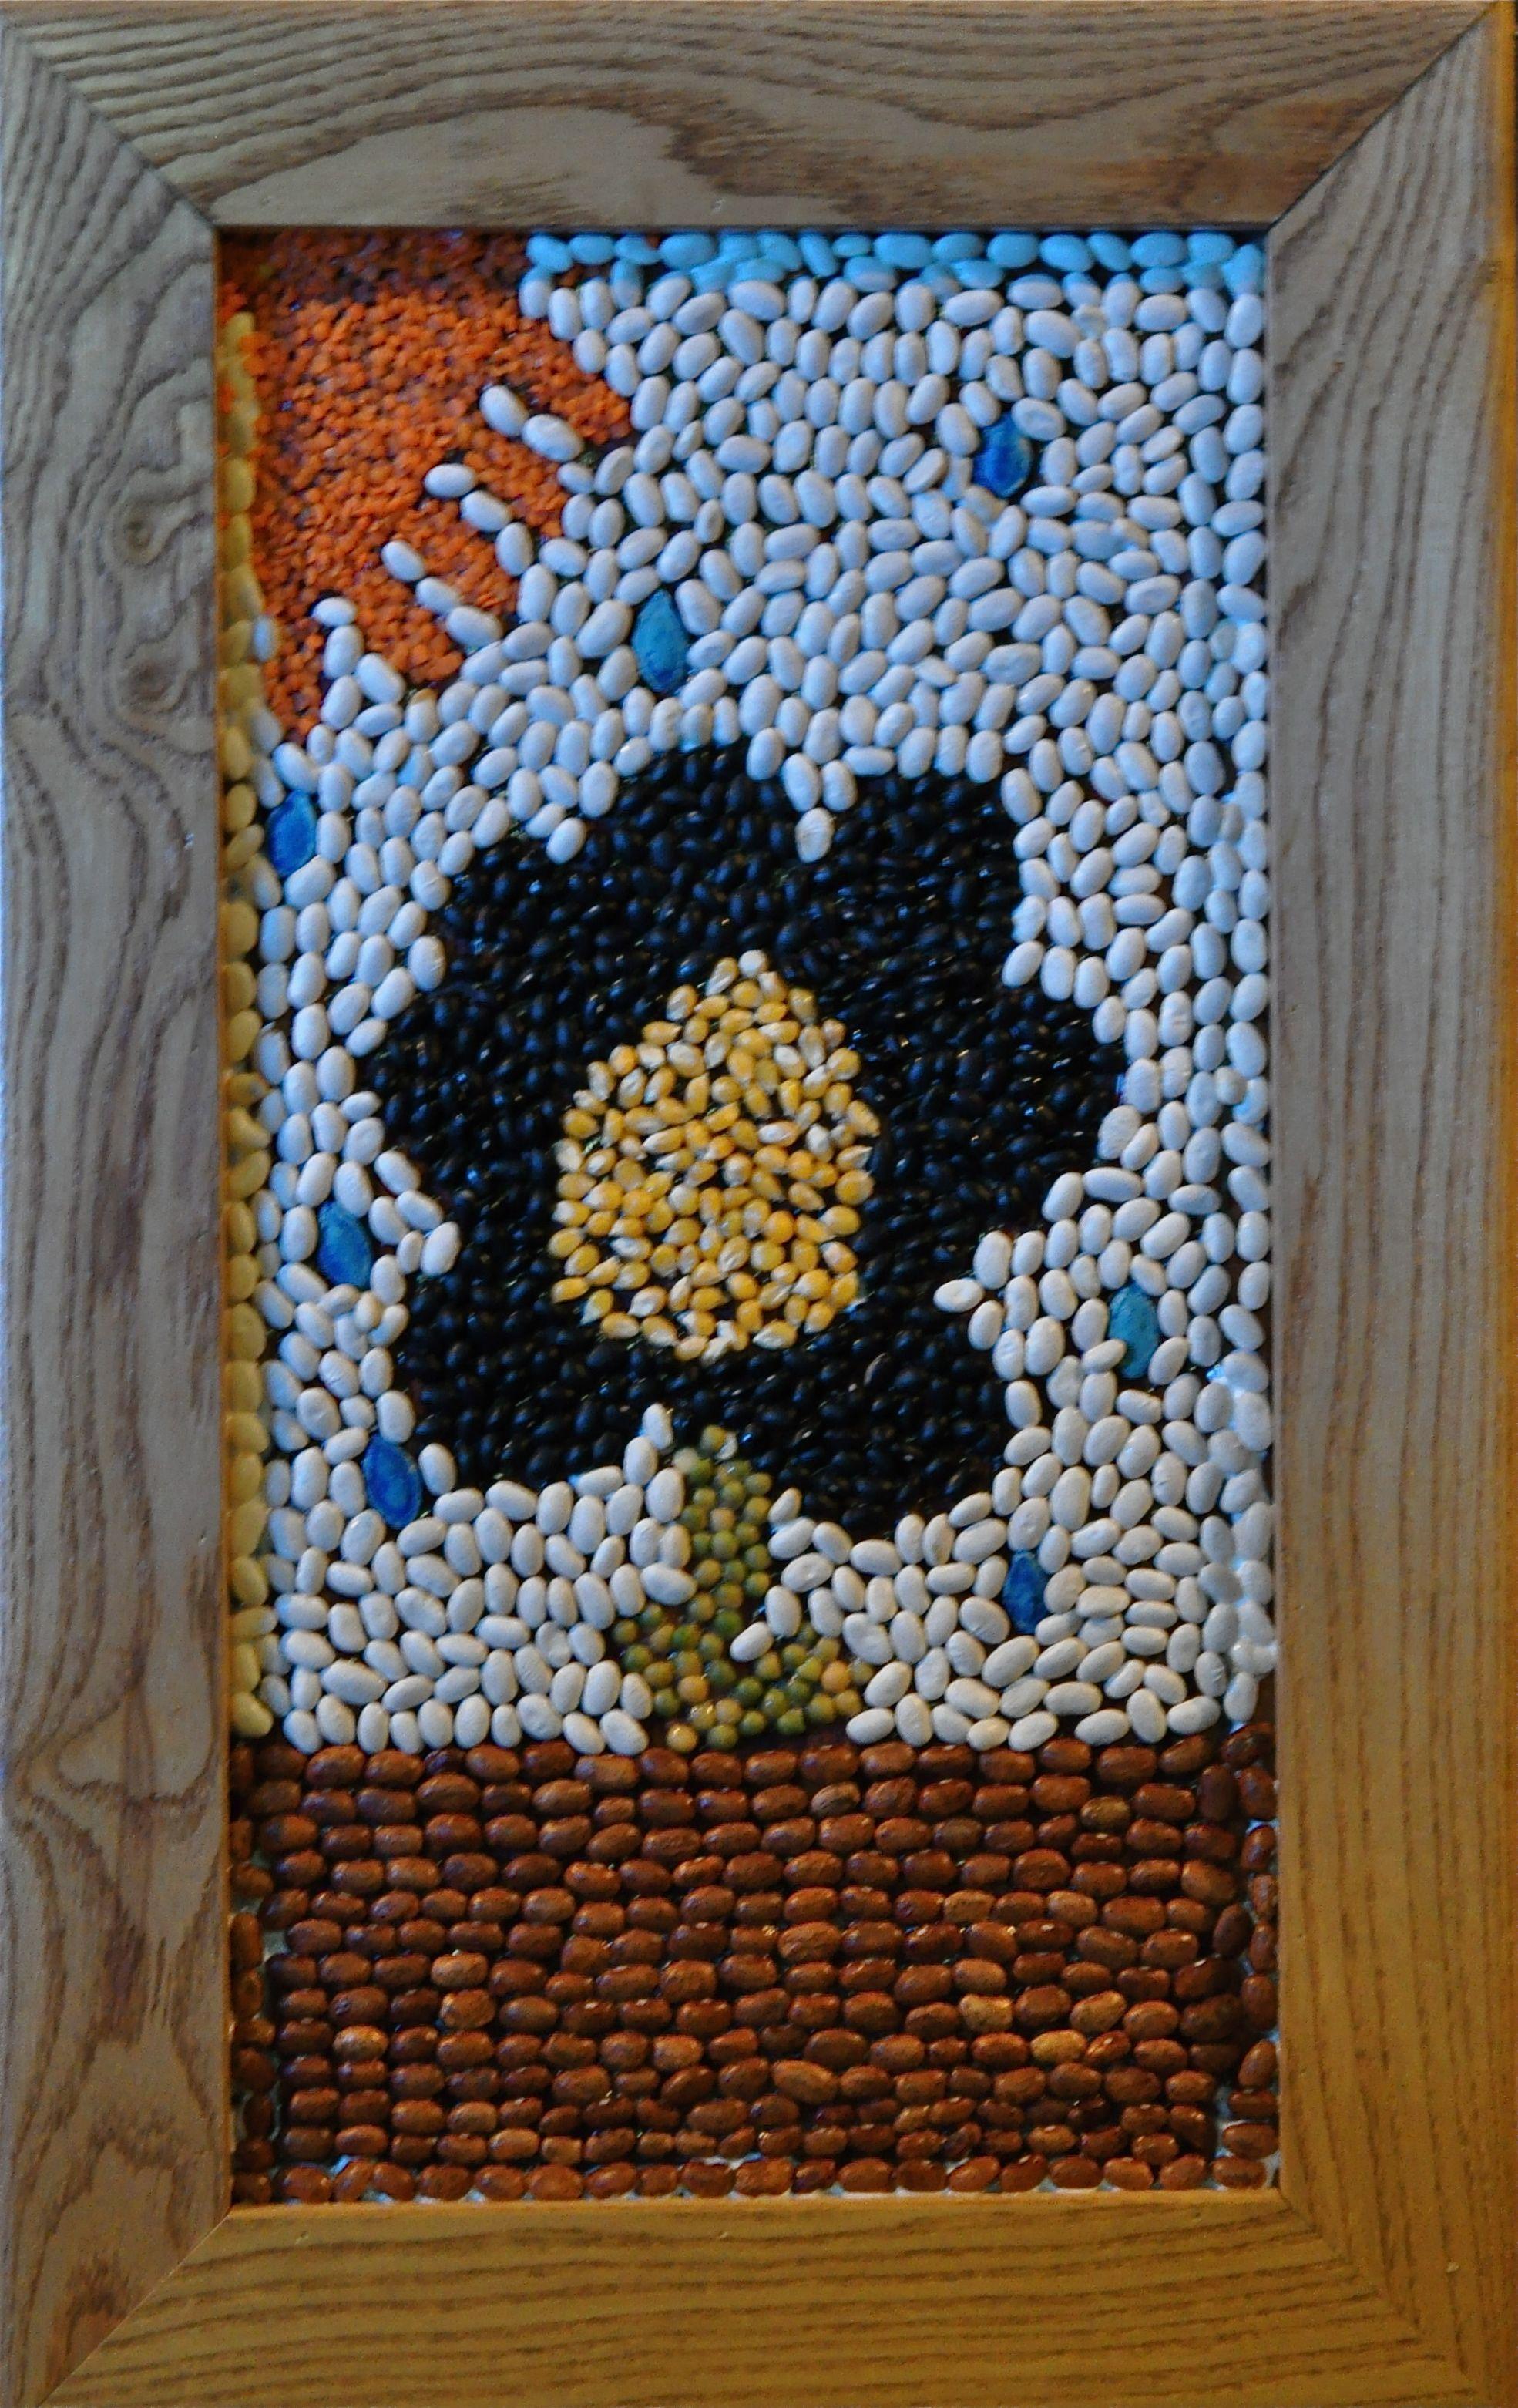 Bean And Seed Mosaic Crafts Ideas Beans Kids Art